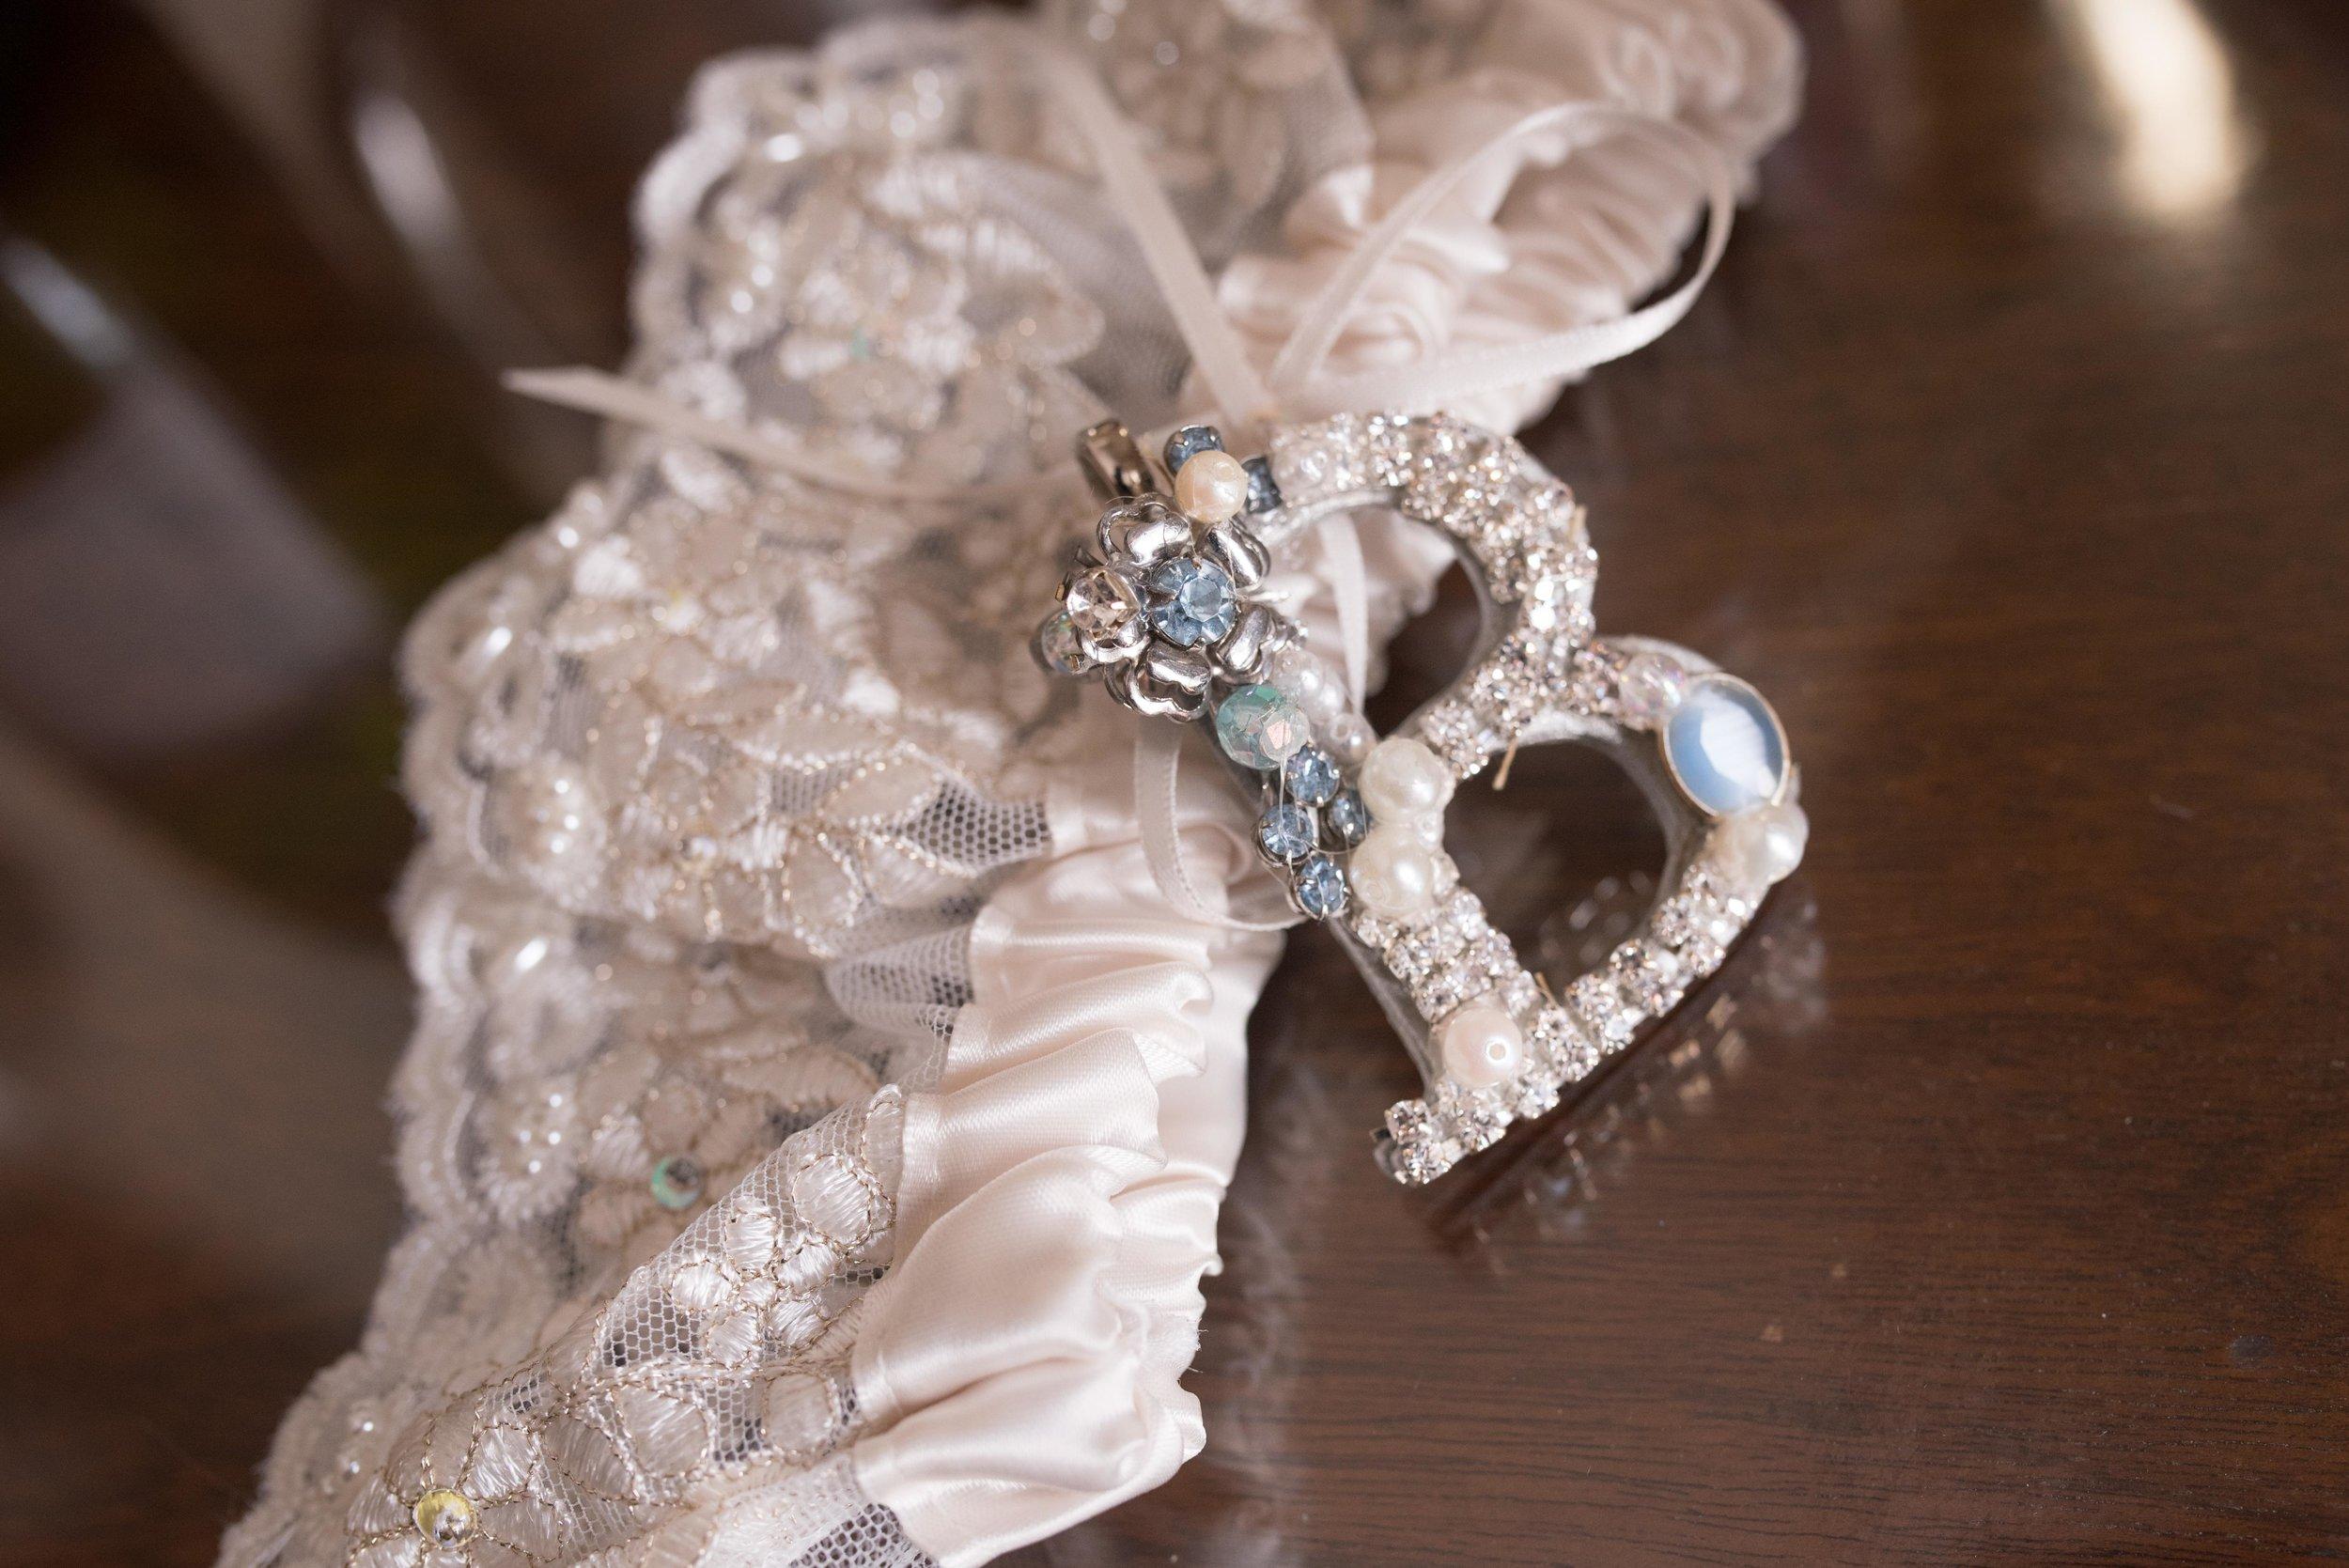 00001_Kuhnert-Wedding-6.jpg